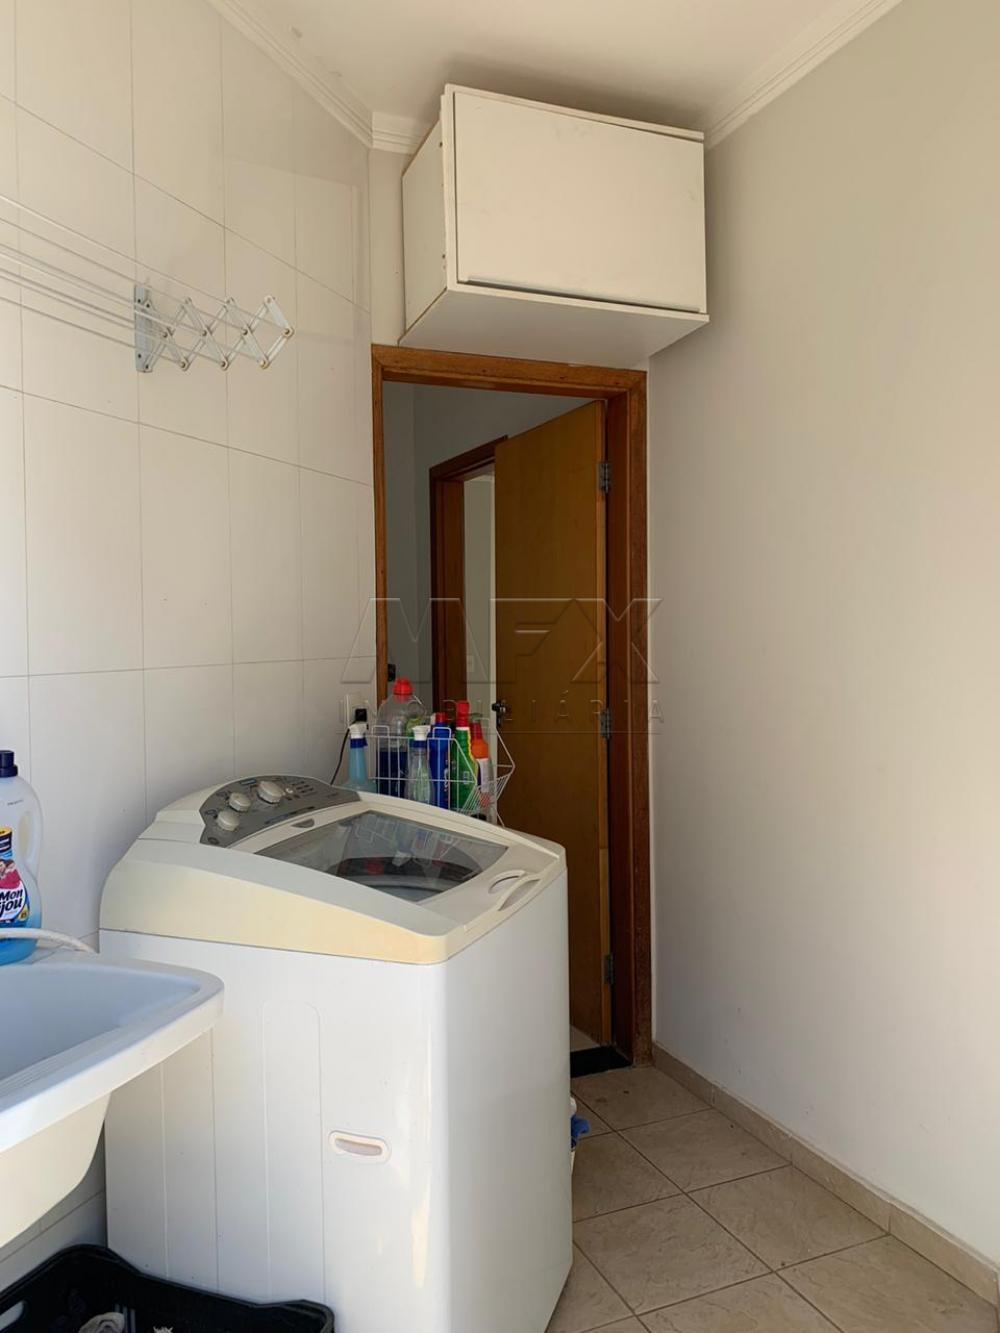 Comprar Casa / Condomínio em Bauru apenas R$ 750.000,00 - Foto 11